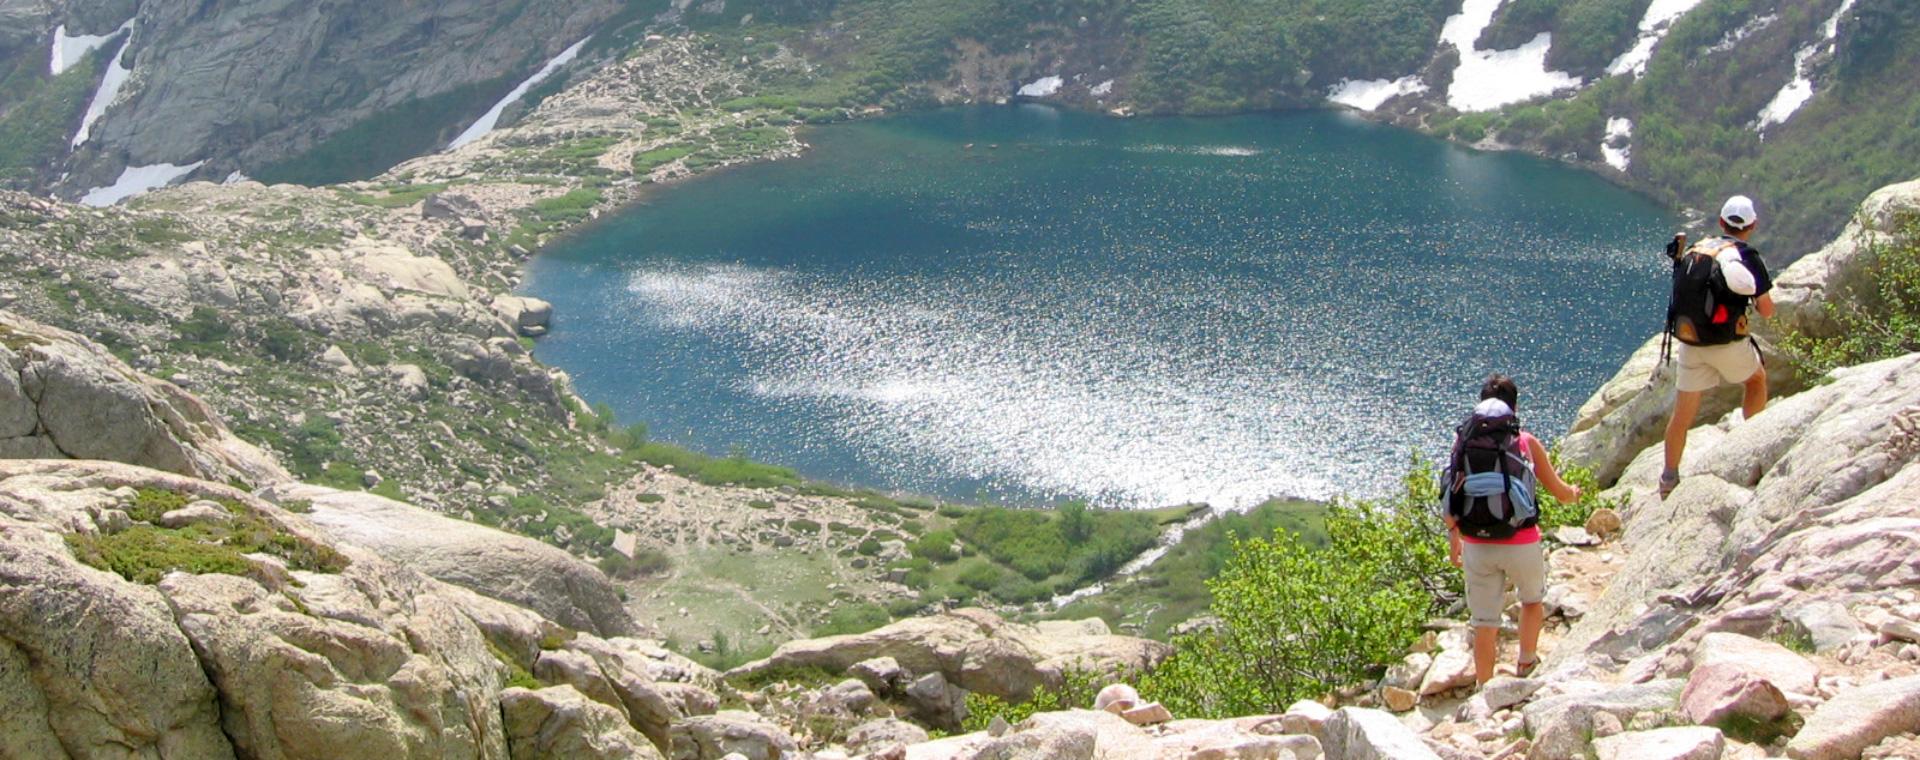 Image Corse : le GR20 Nord